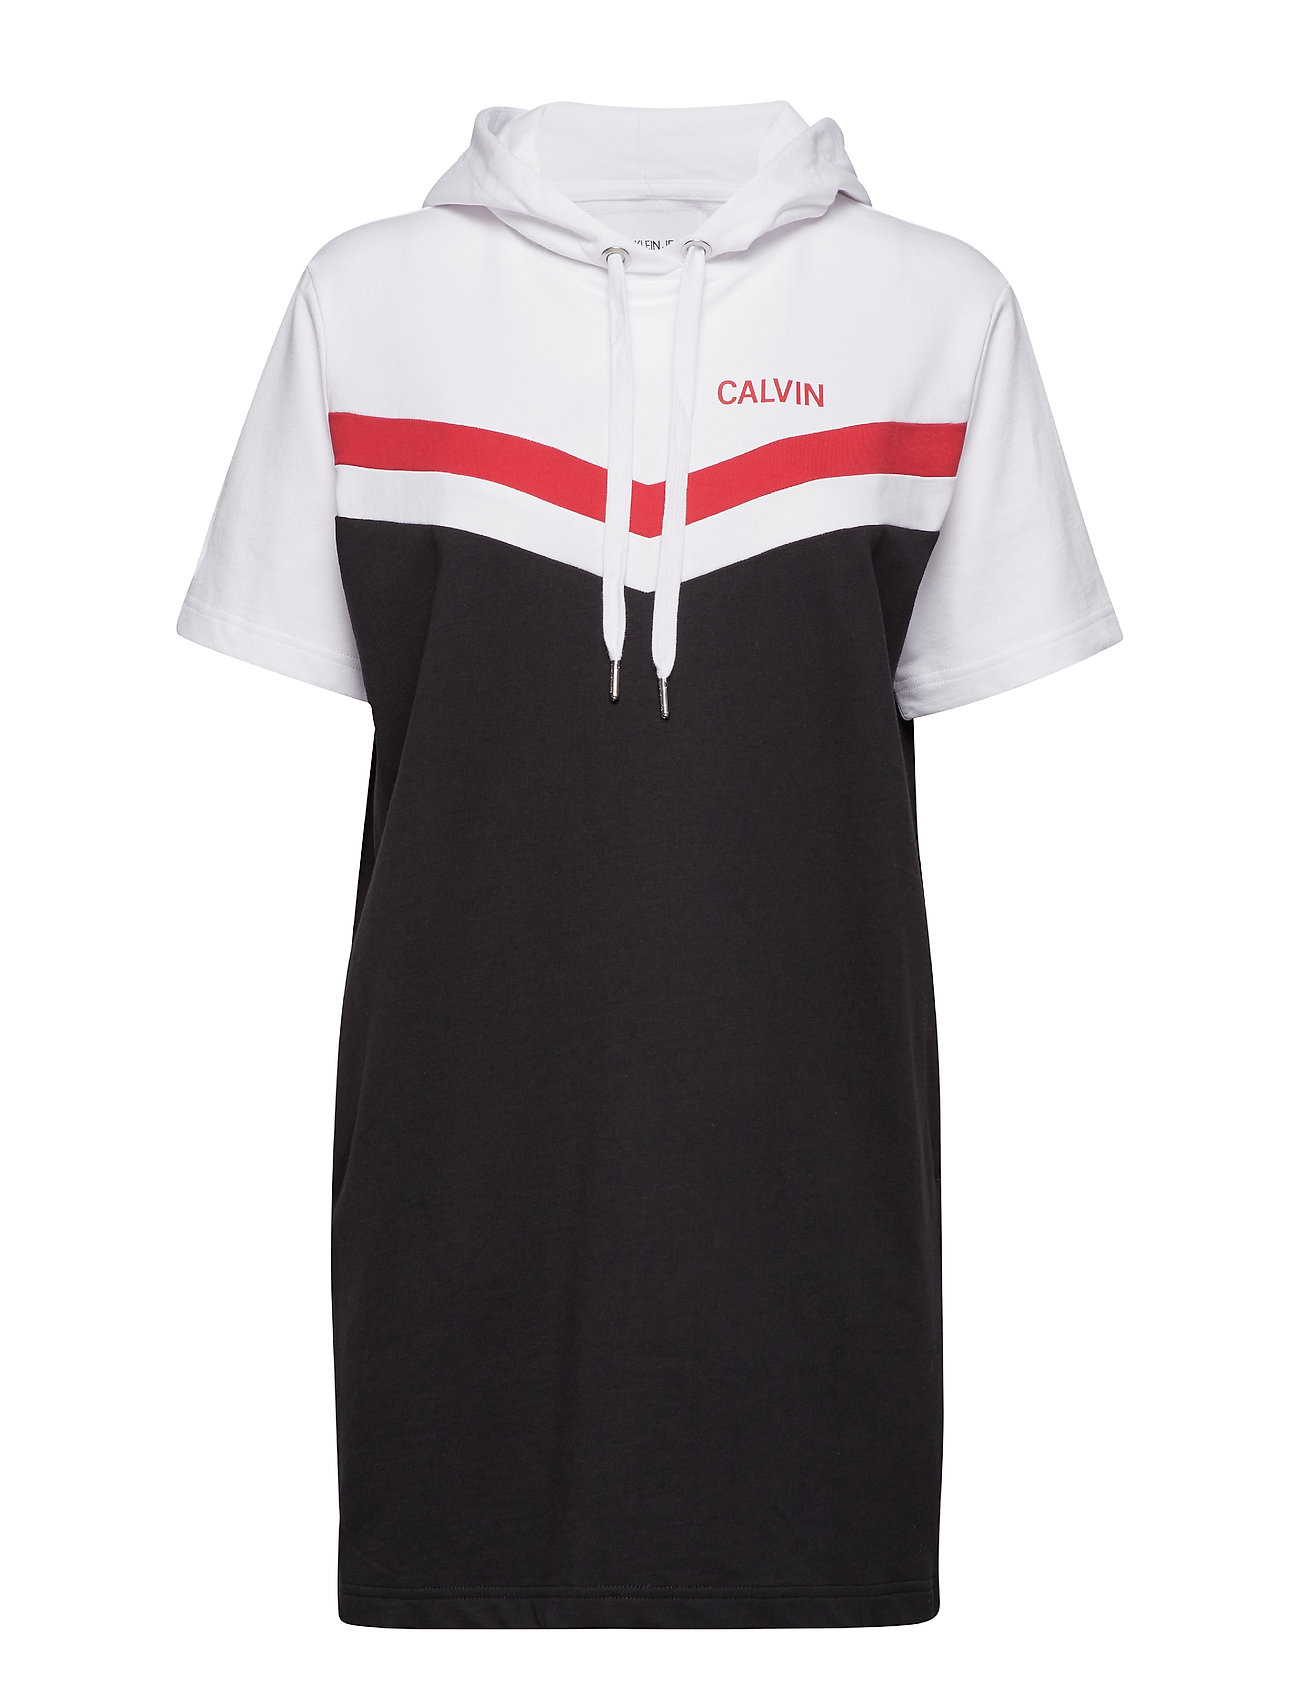 Calvin Klein Jeans CHEERLEADER COLOR BL - CK BLACK/ WHITE/ RED